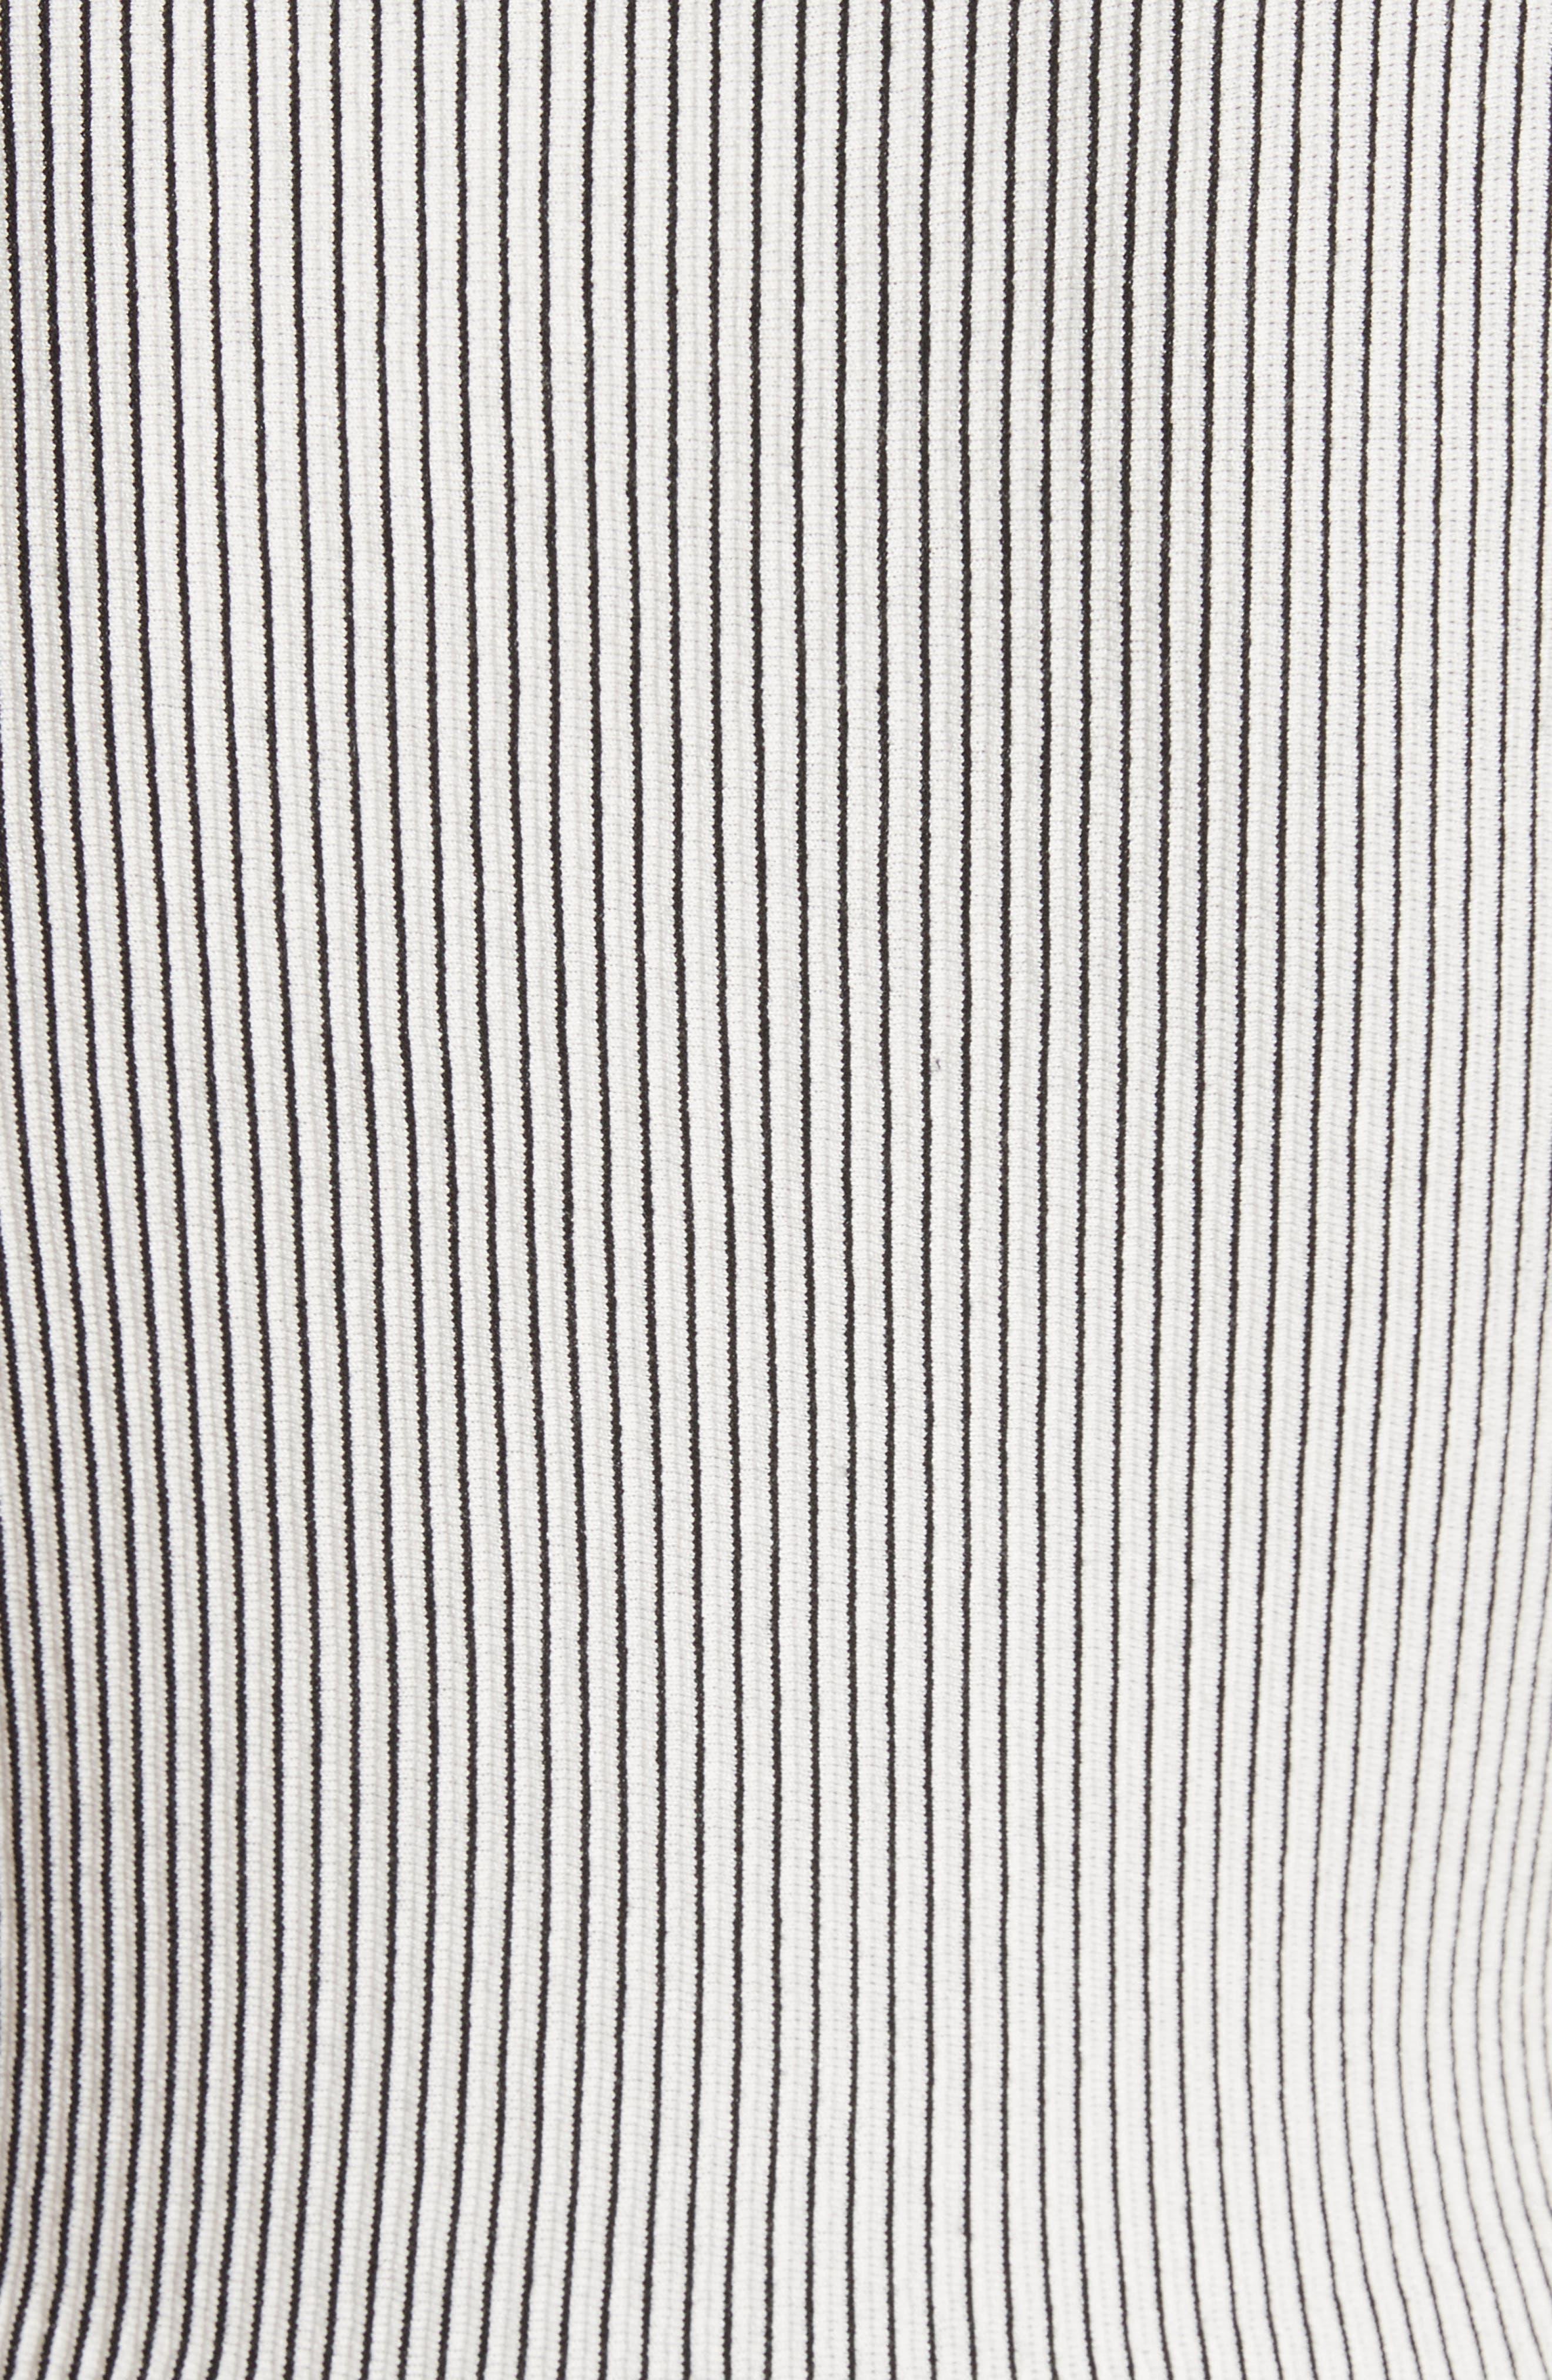 Canelis Prosecco Sleeveless Rib Knit Top,                             Alternate thumbnail 5, color,                             907